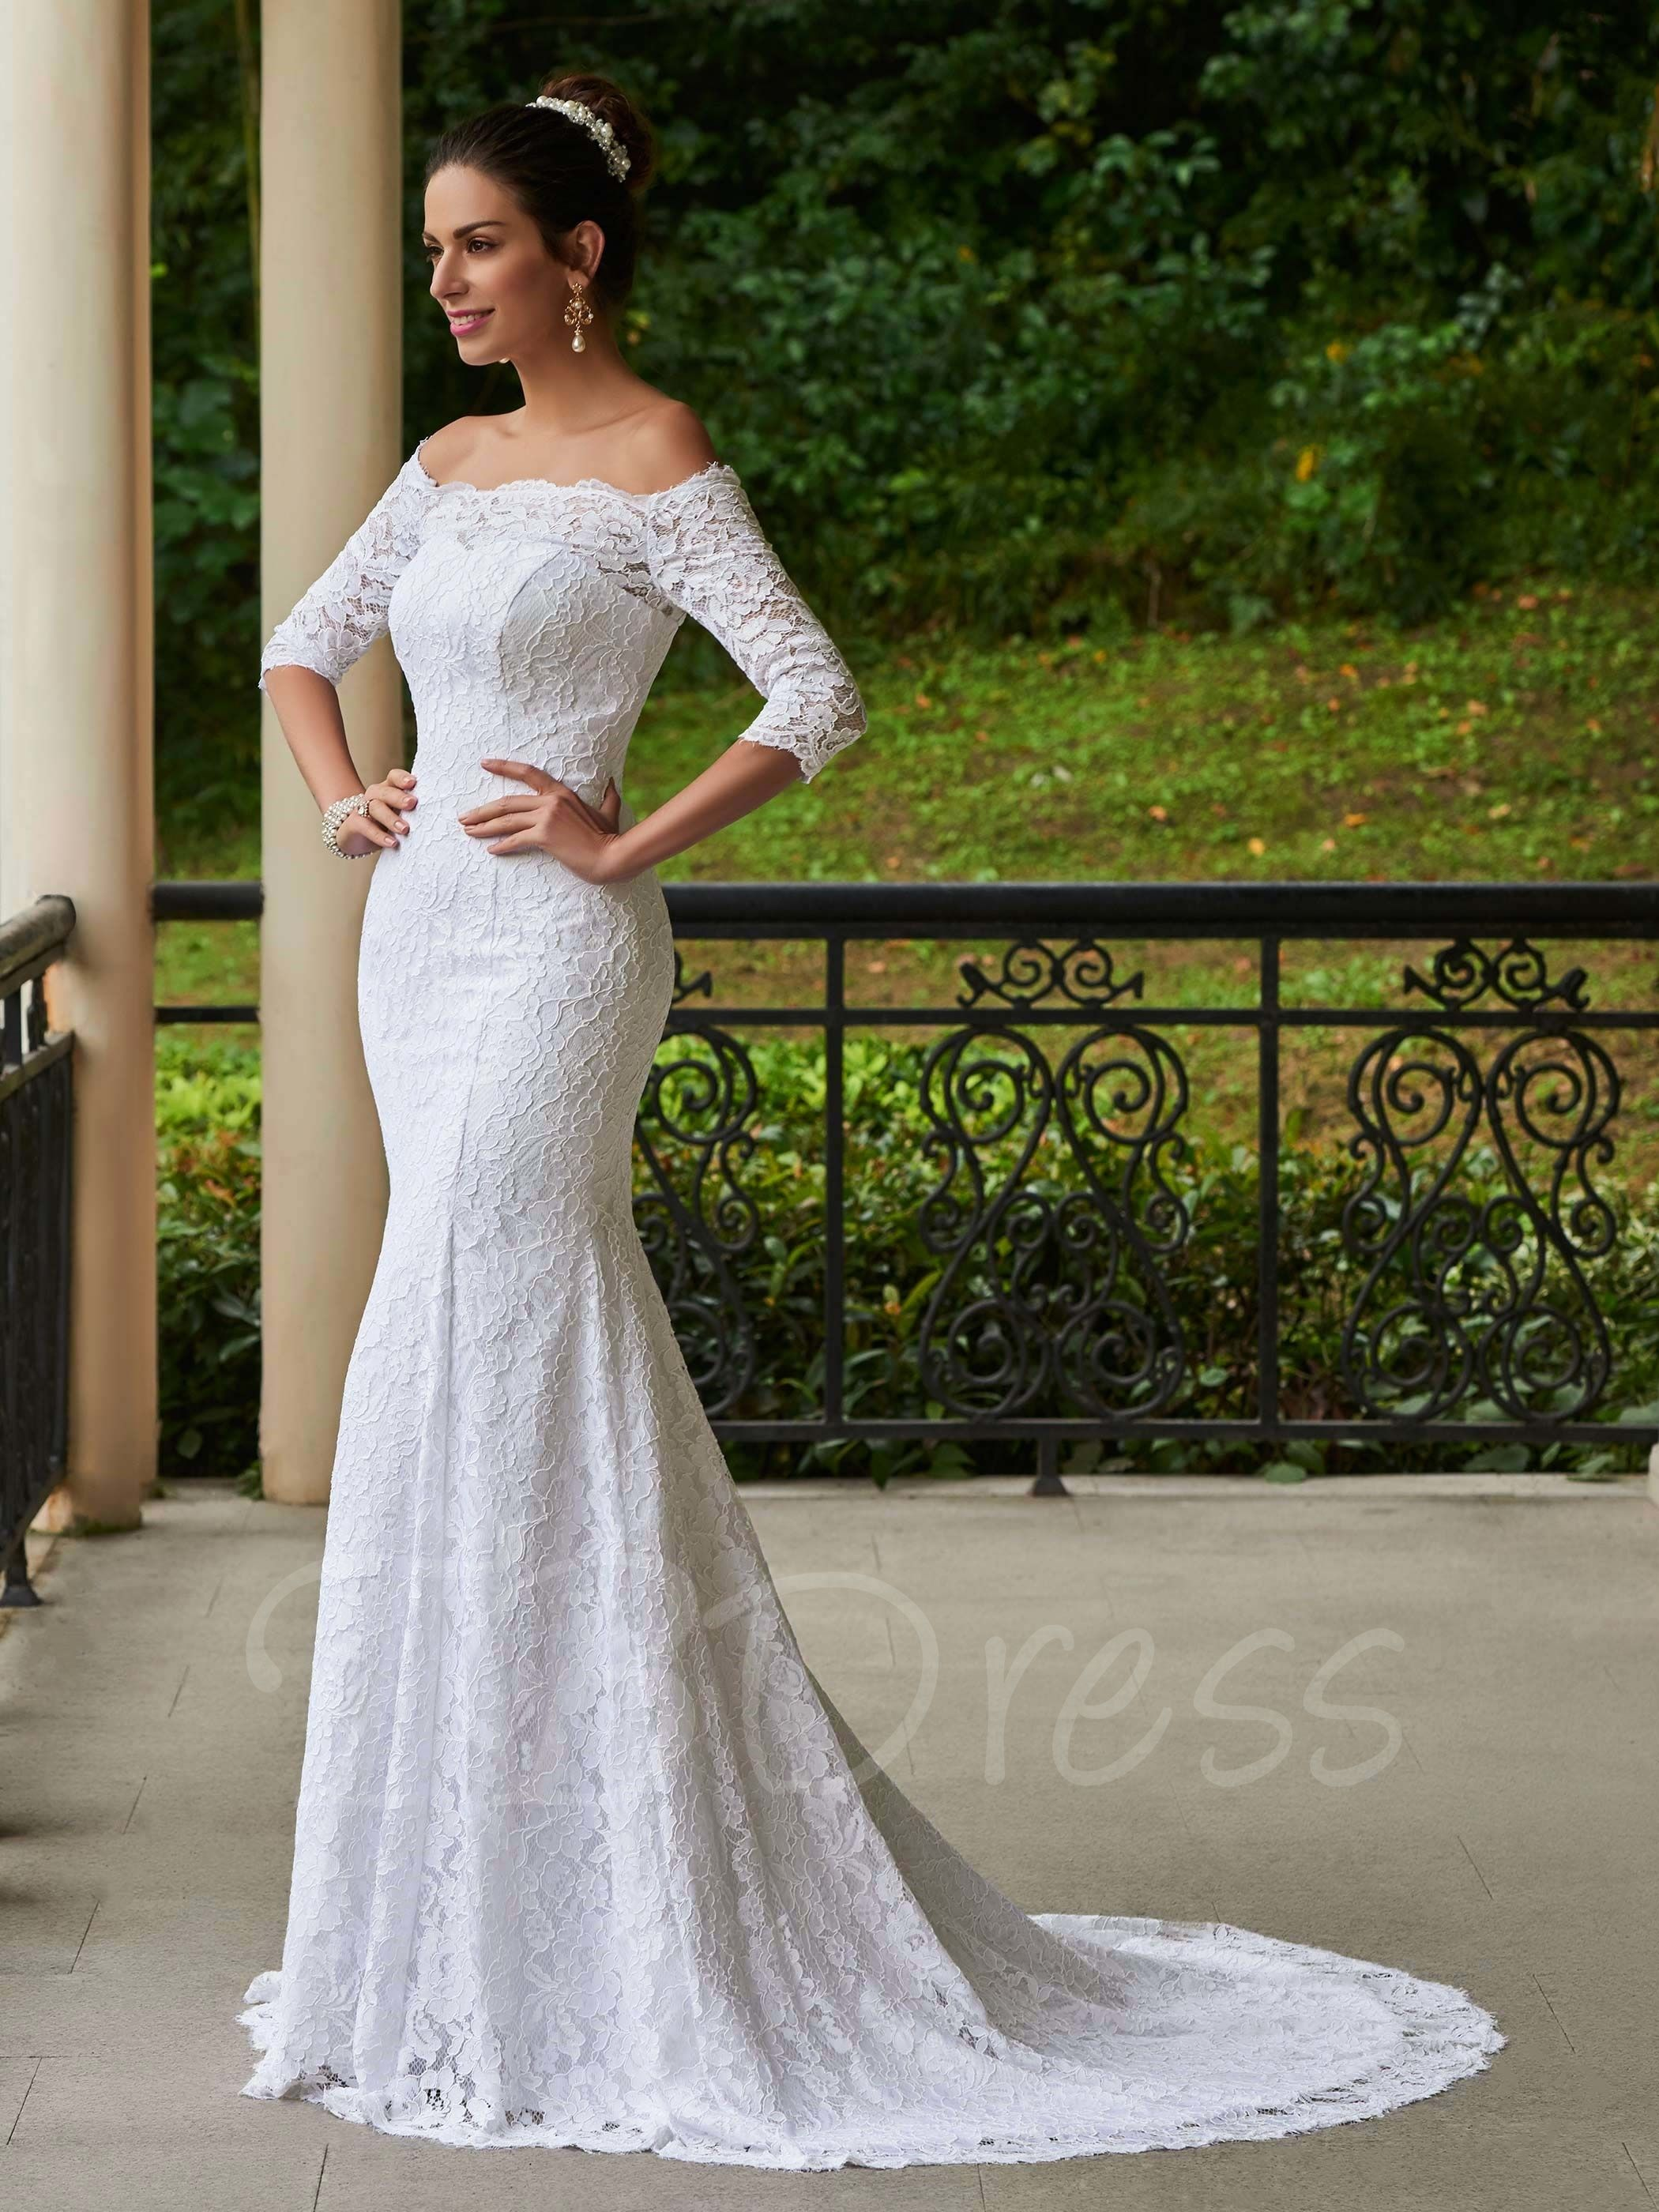 Off The Shoulder Mermaid Lace Wedding Dress With Sleeves Lace Wedding Dress With Sleeves Wedding Dresses Lace Wedding Dresses [ 2800 x 2100 Pixel ]